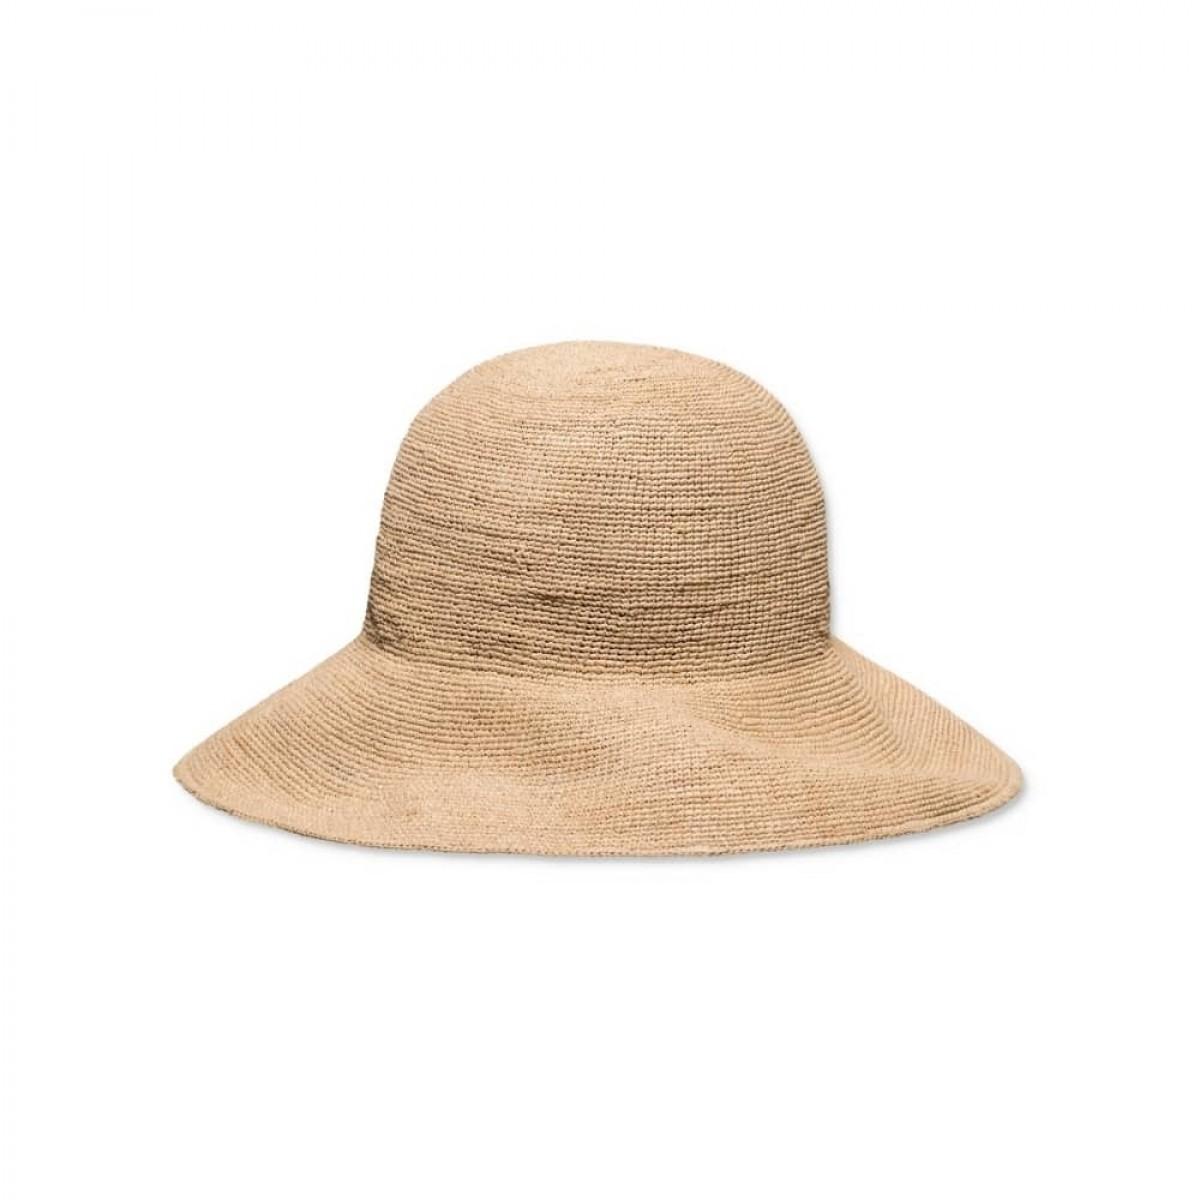 abigail strå-hat - front